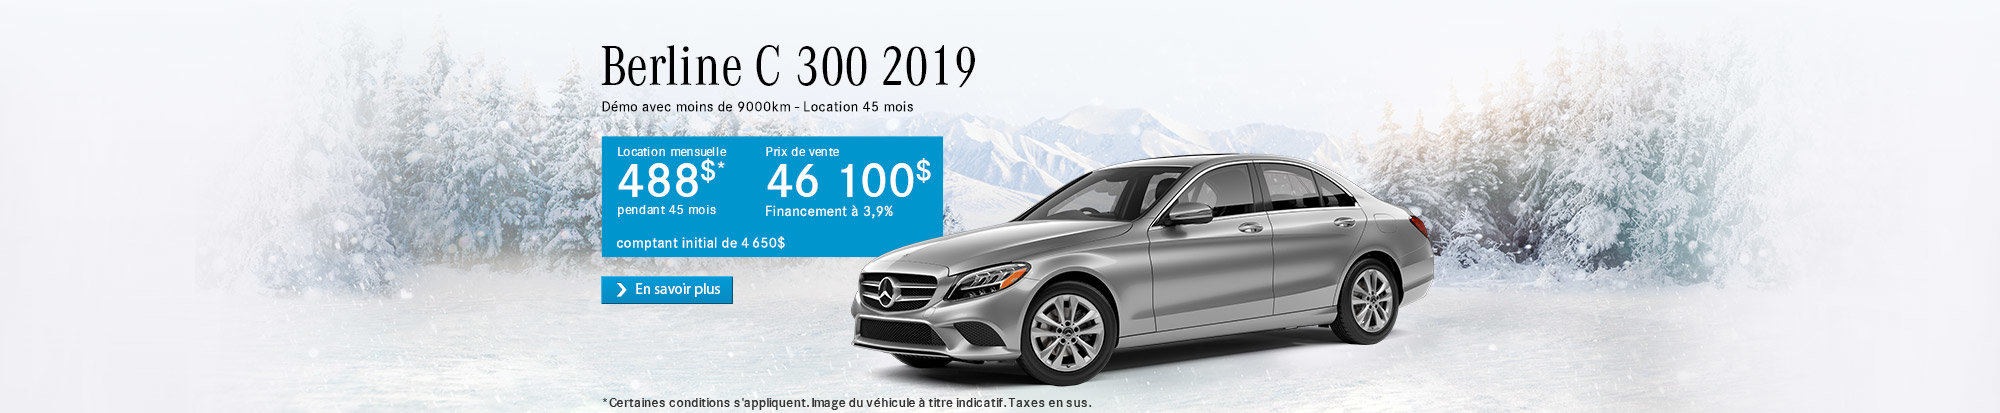 Classe C 300 2019 - web